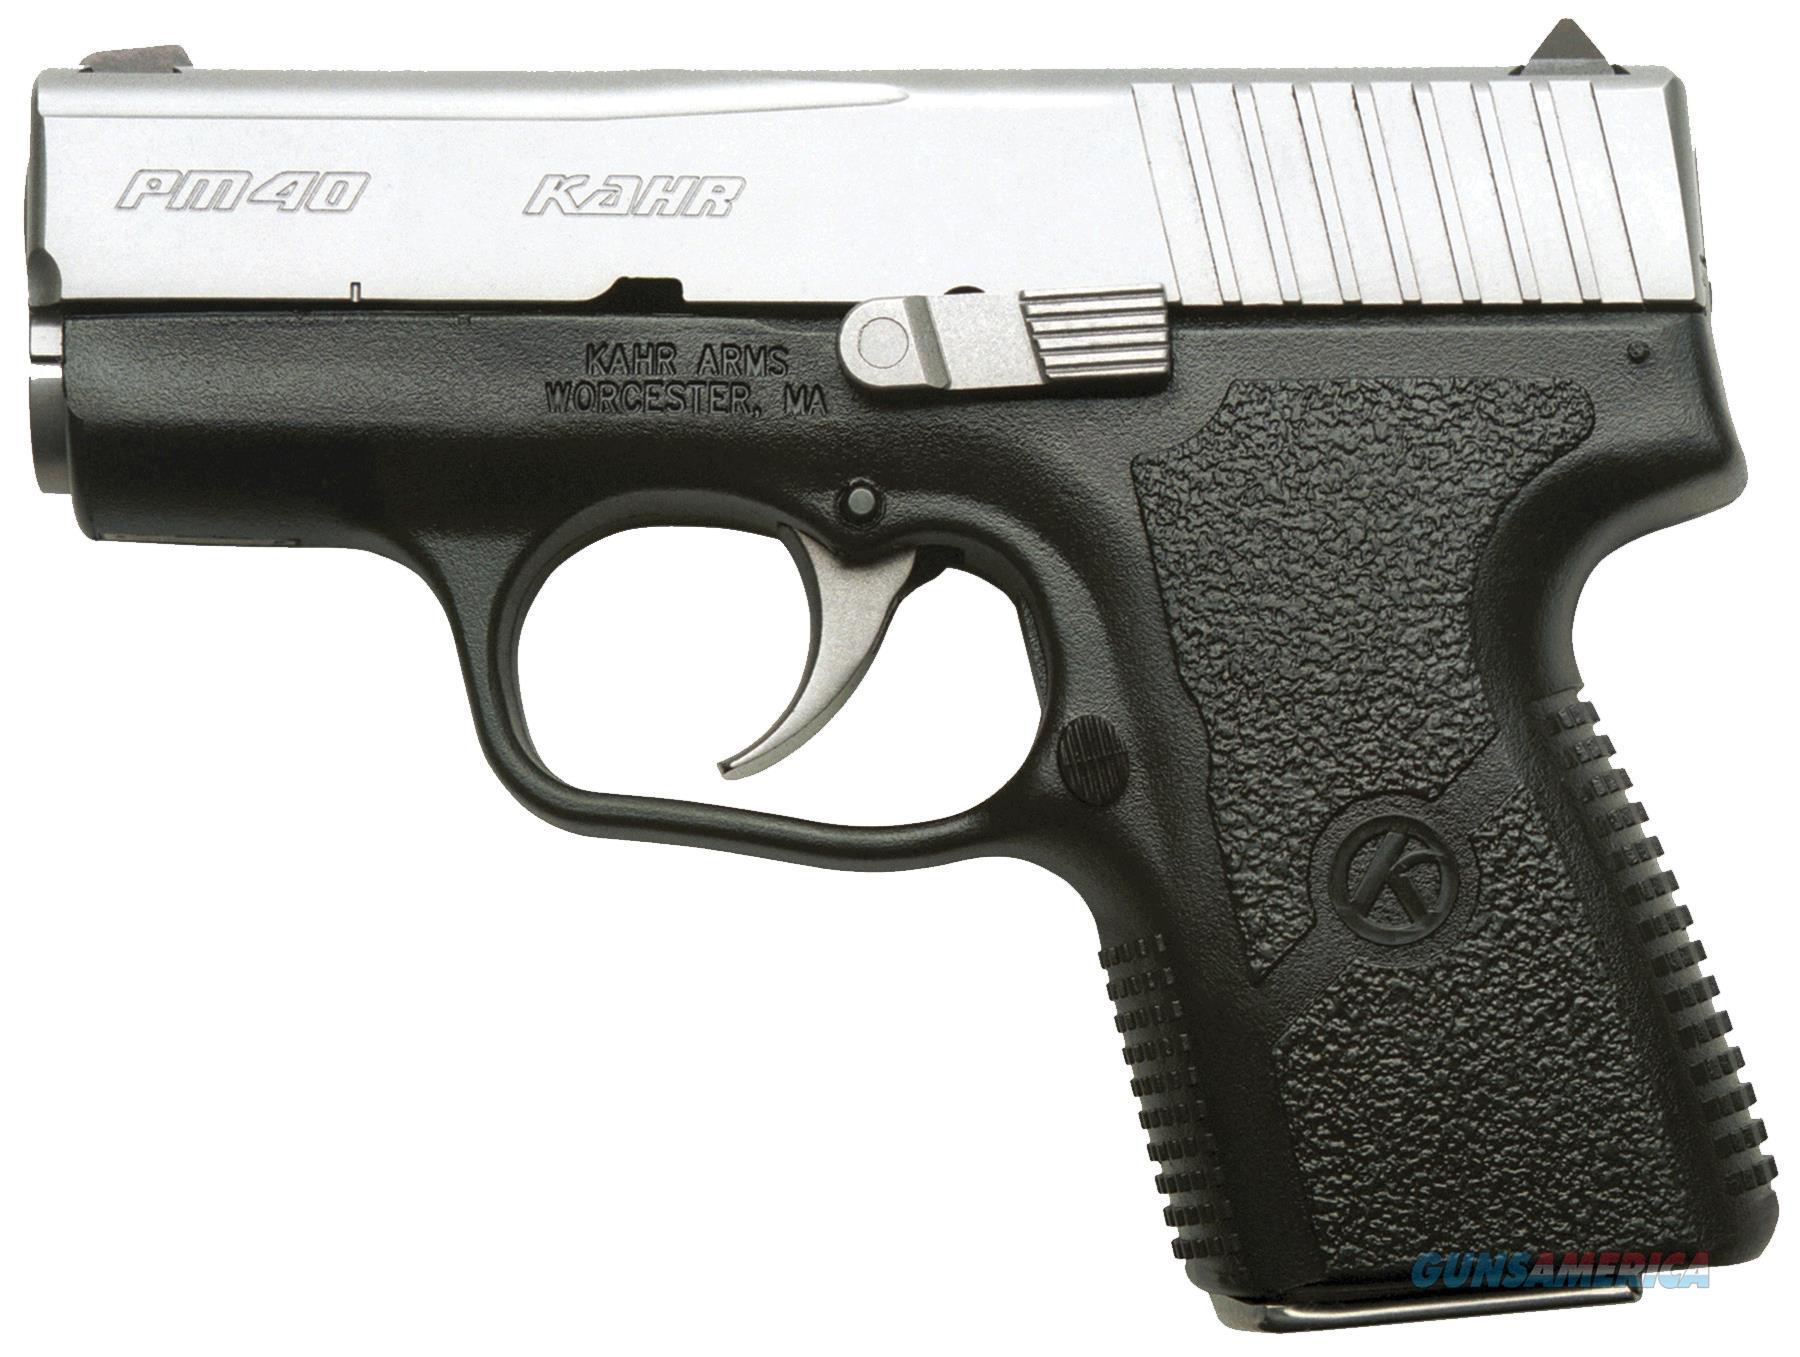 Pm40 40 S&Amp;W Ss/Poly 5+1 Ns   * PM4043N  Guns > Pistols > K Misc Pistols